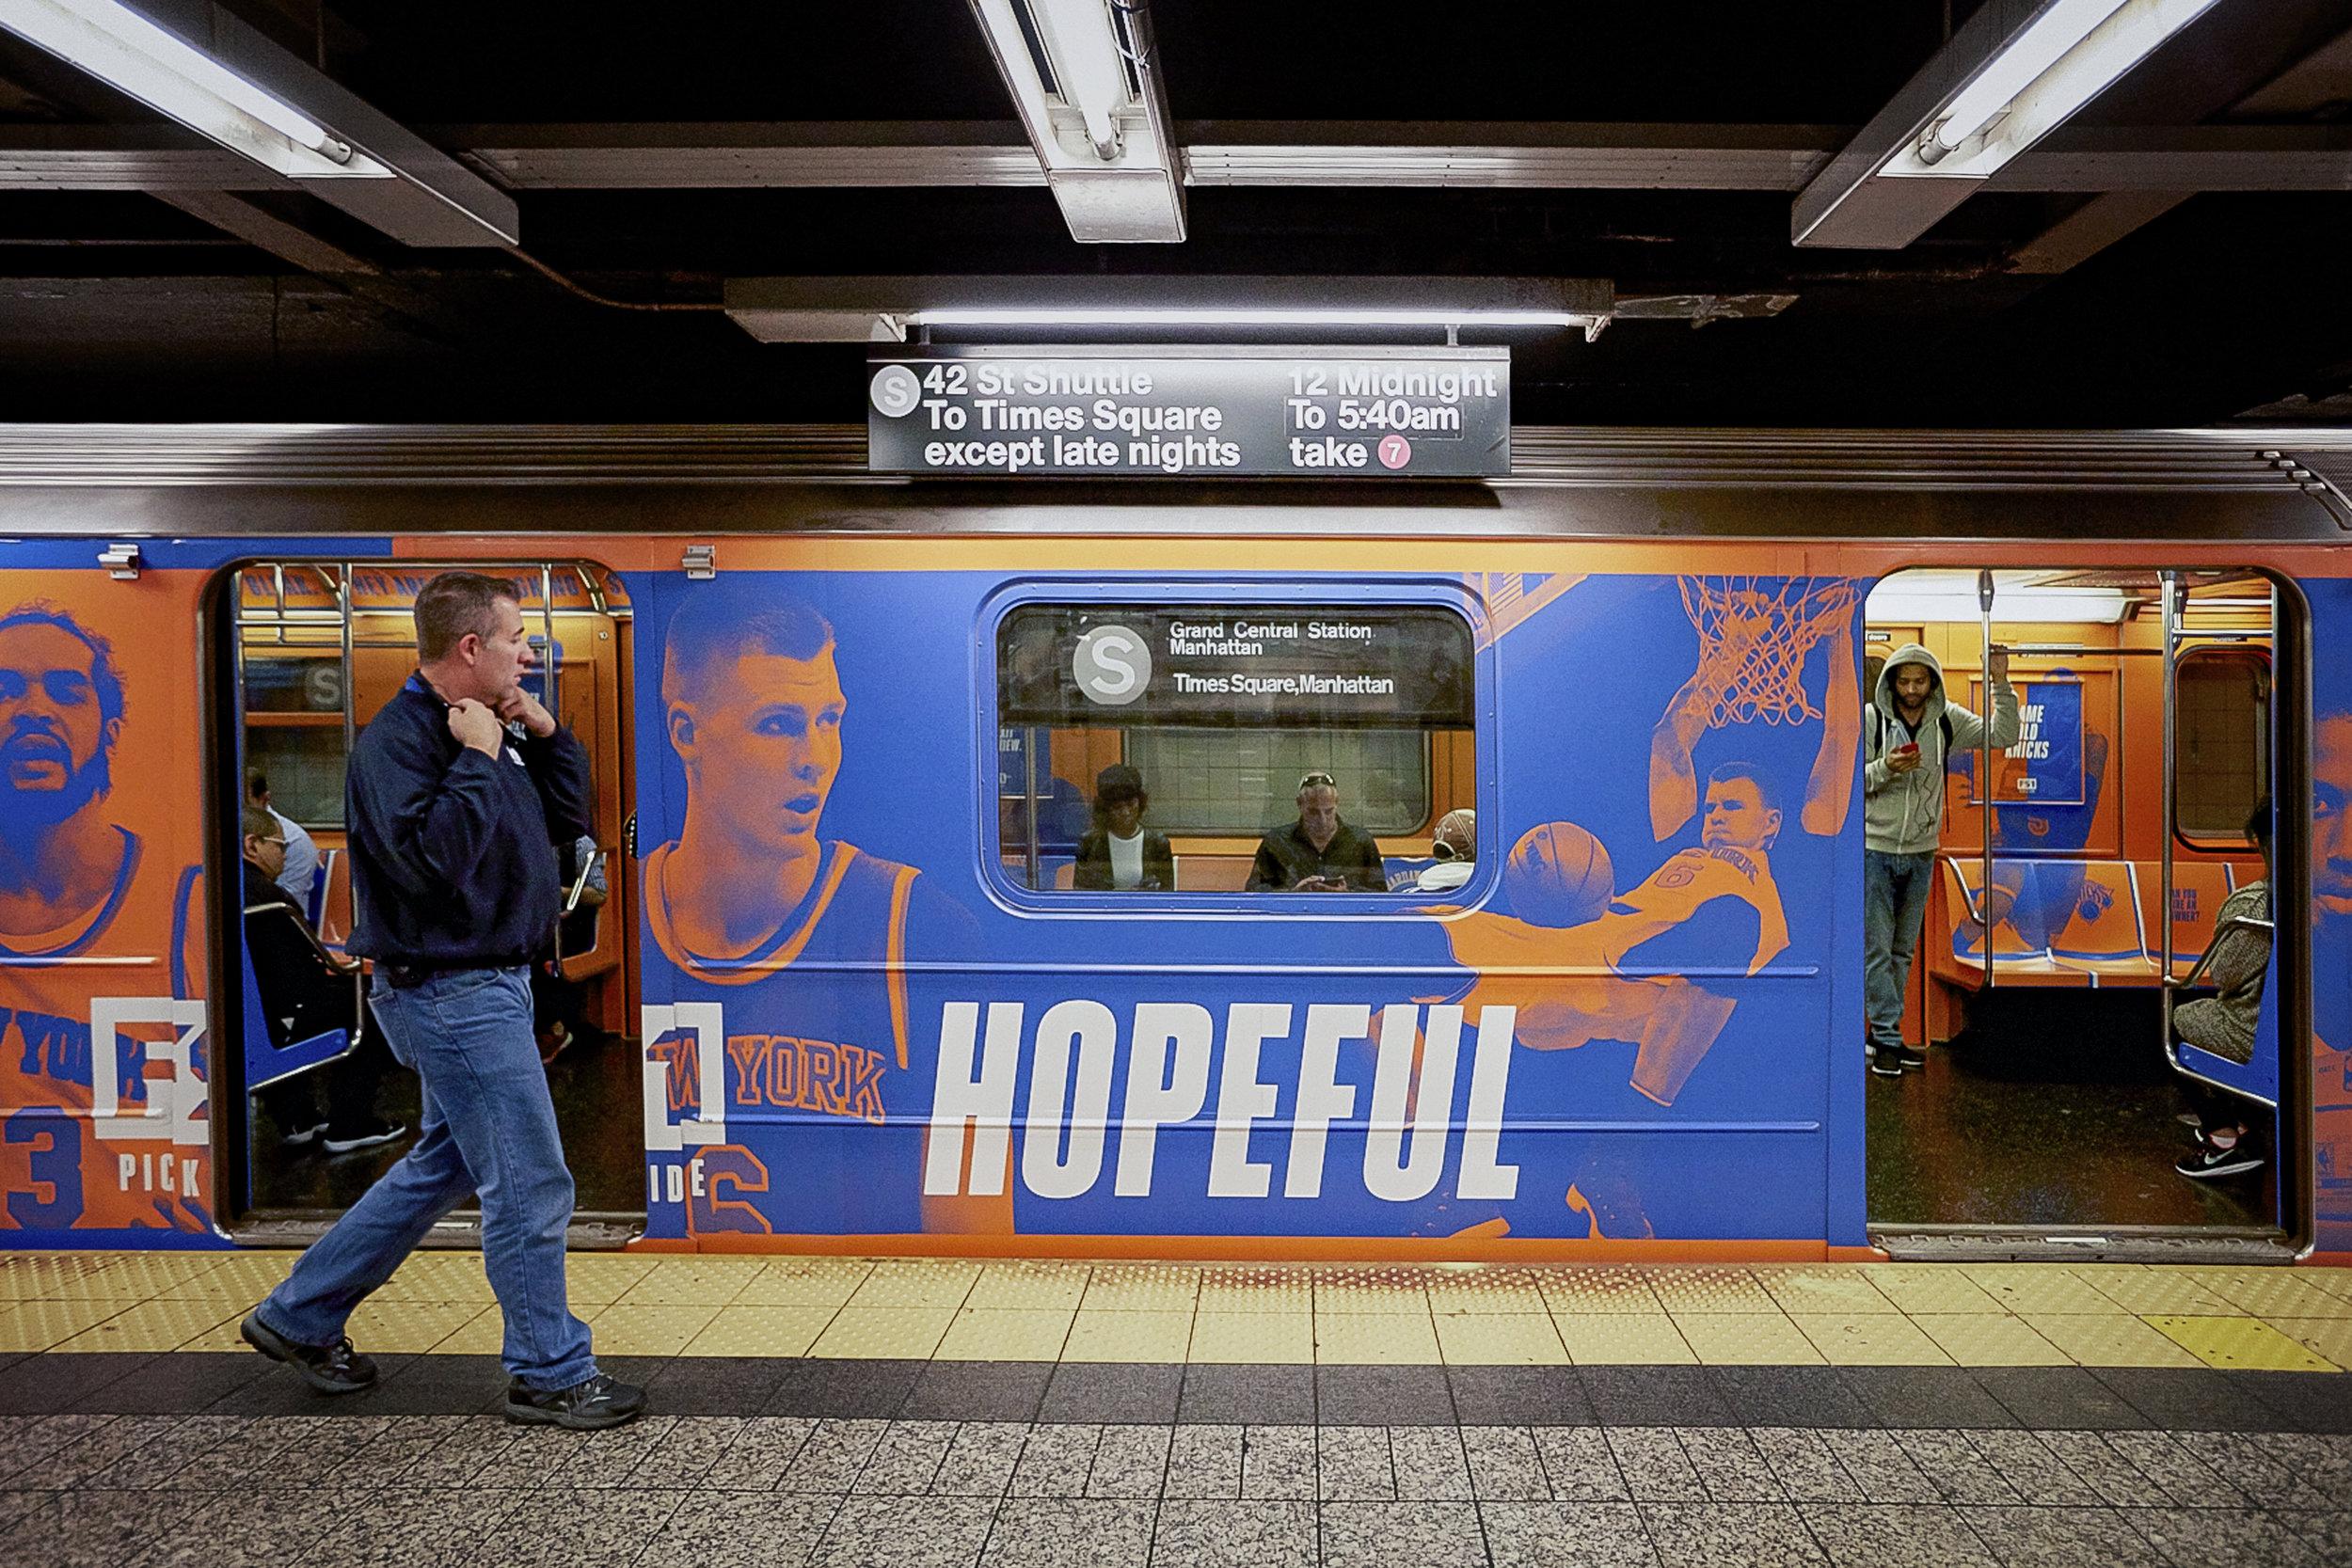 FS1_subway_shots_02.jpg